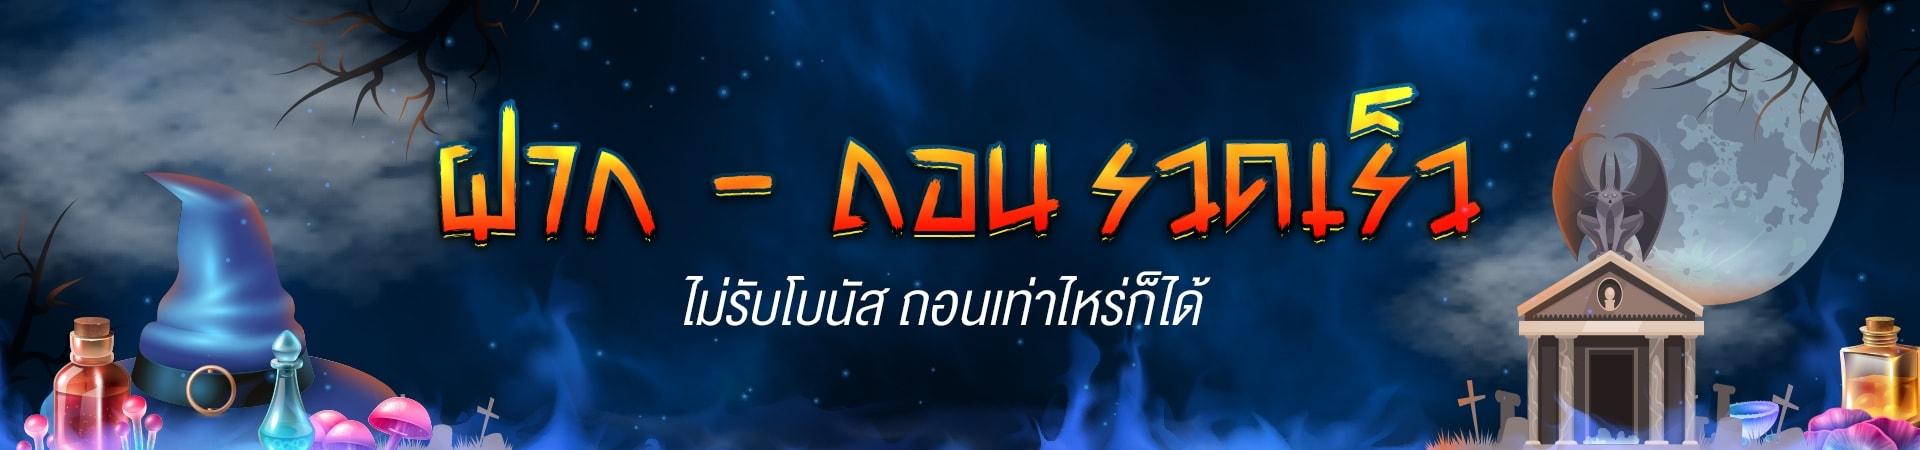 slot (@mgcslot) Cover Image